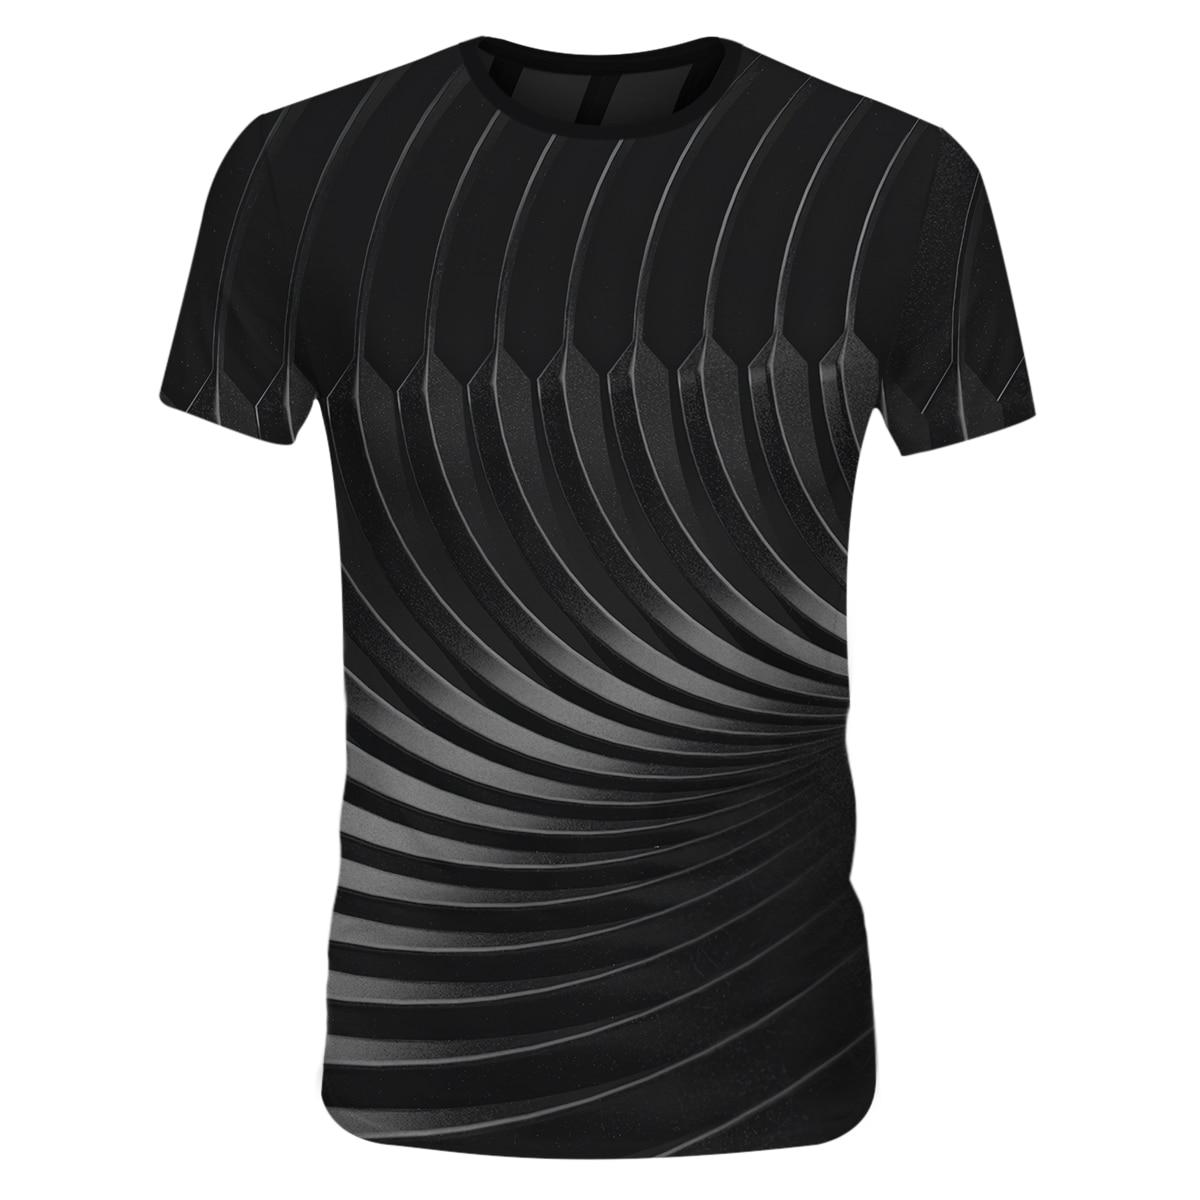 Cloudstyle мужские футболки с 3D принтом геометрические Короткие рукава крутые летние футболки для мужчин Harajuku повседневные Хип-хоп футболки 2021 ...